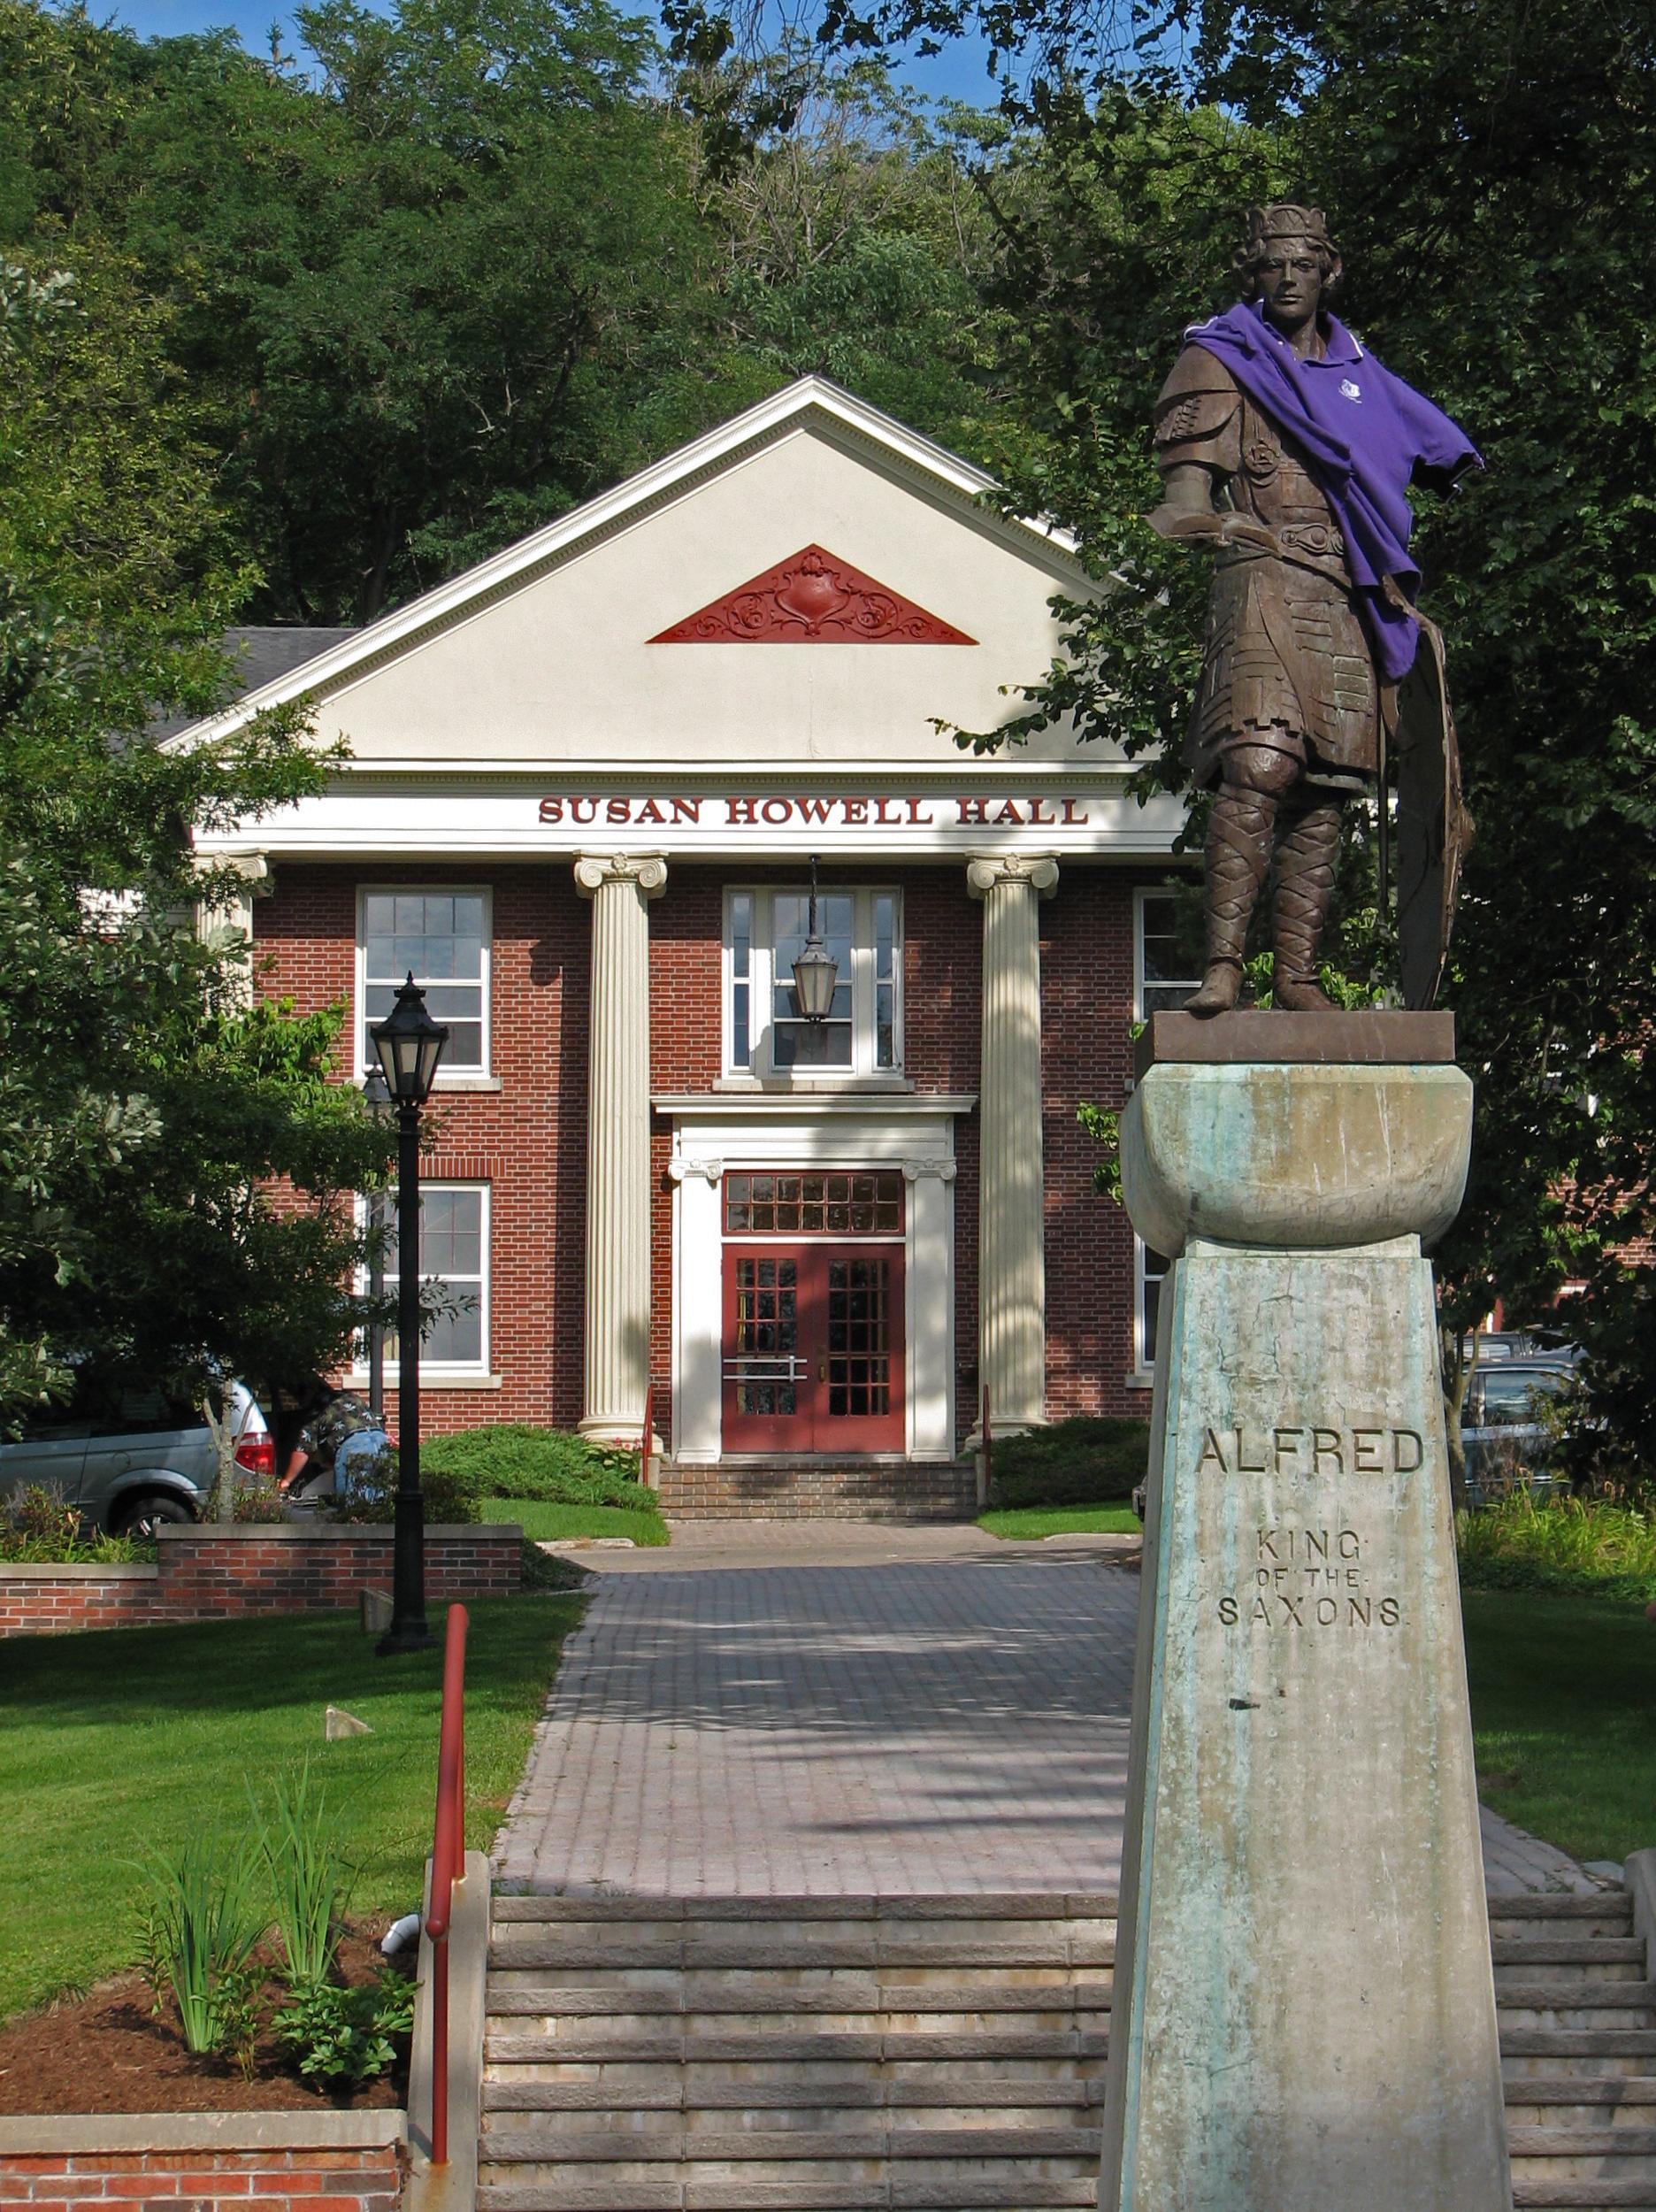 alfreduniversity_AlfredUniversity|Wiki|Everipedia